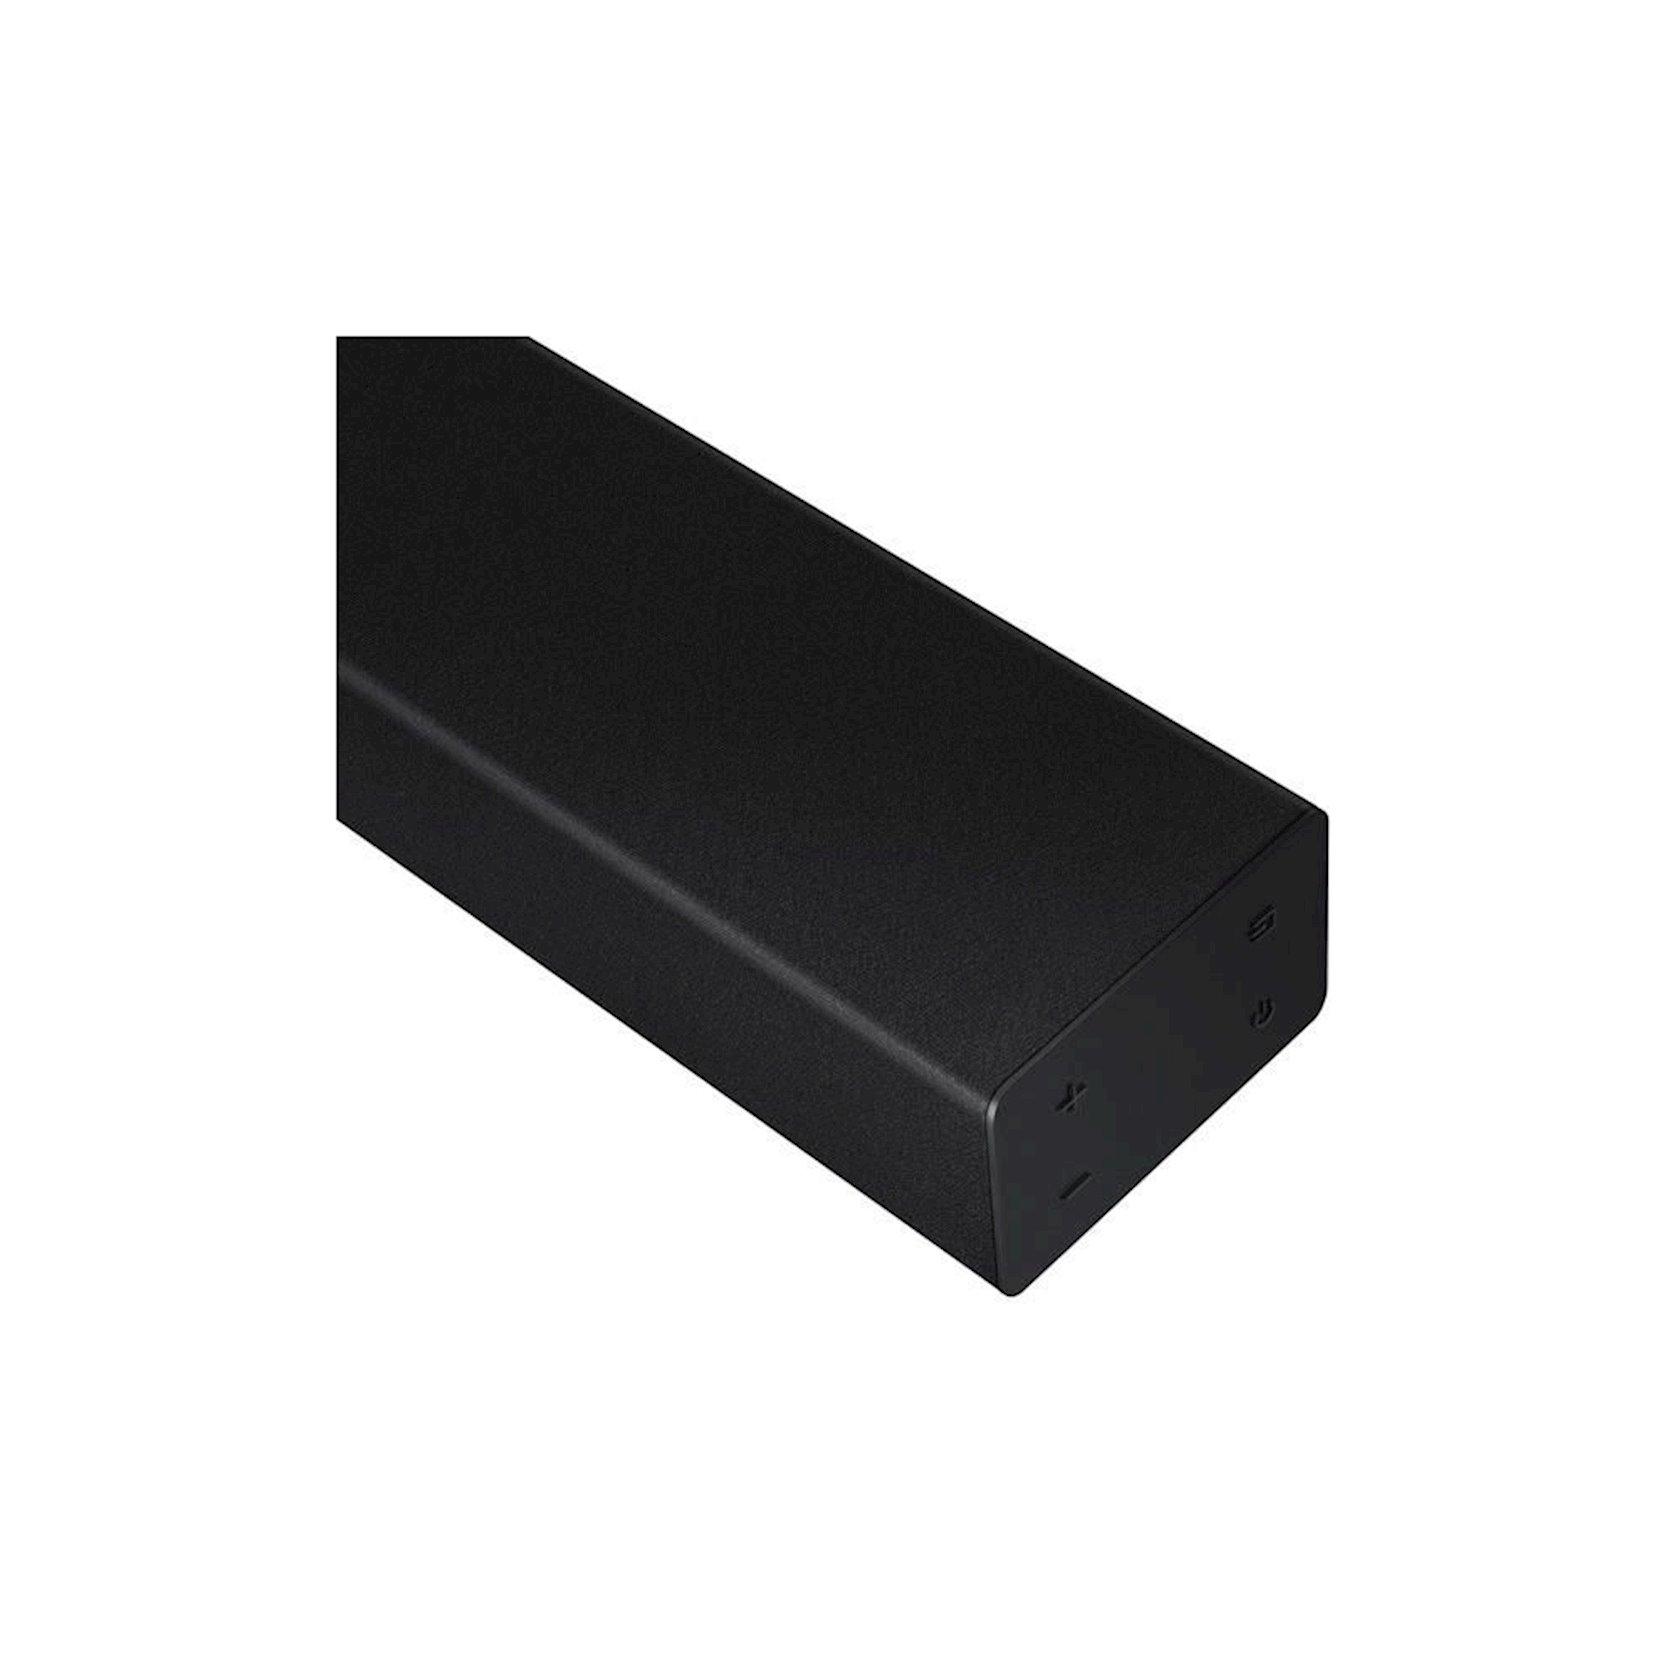 Saundbar Samsung HW-T400